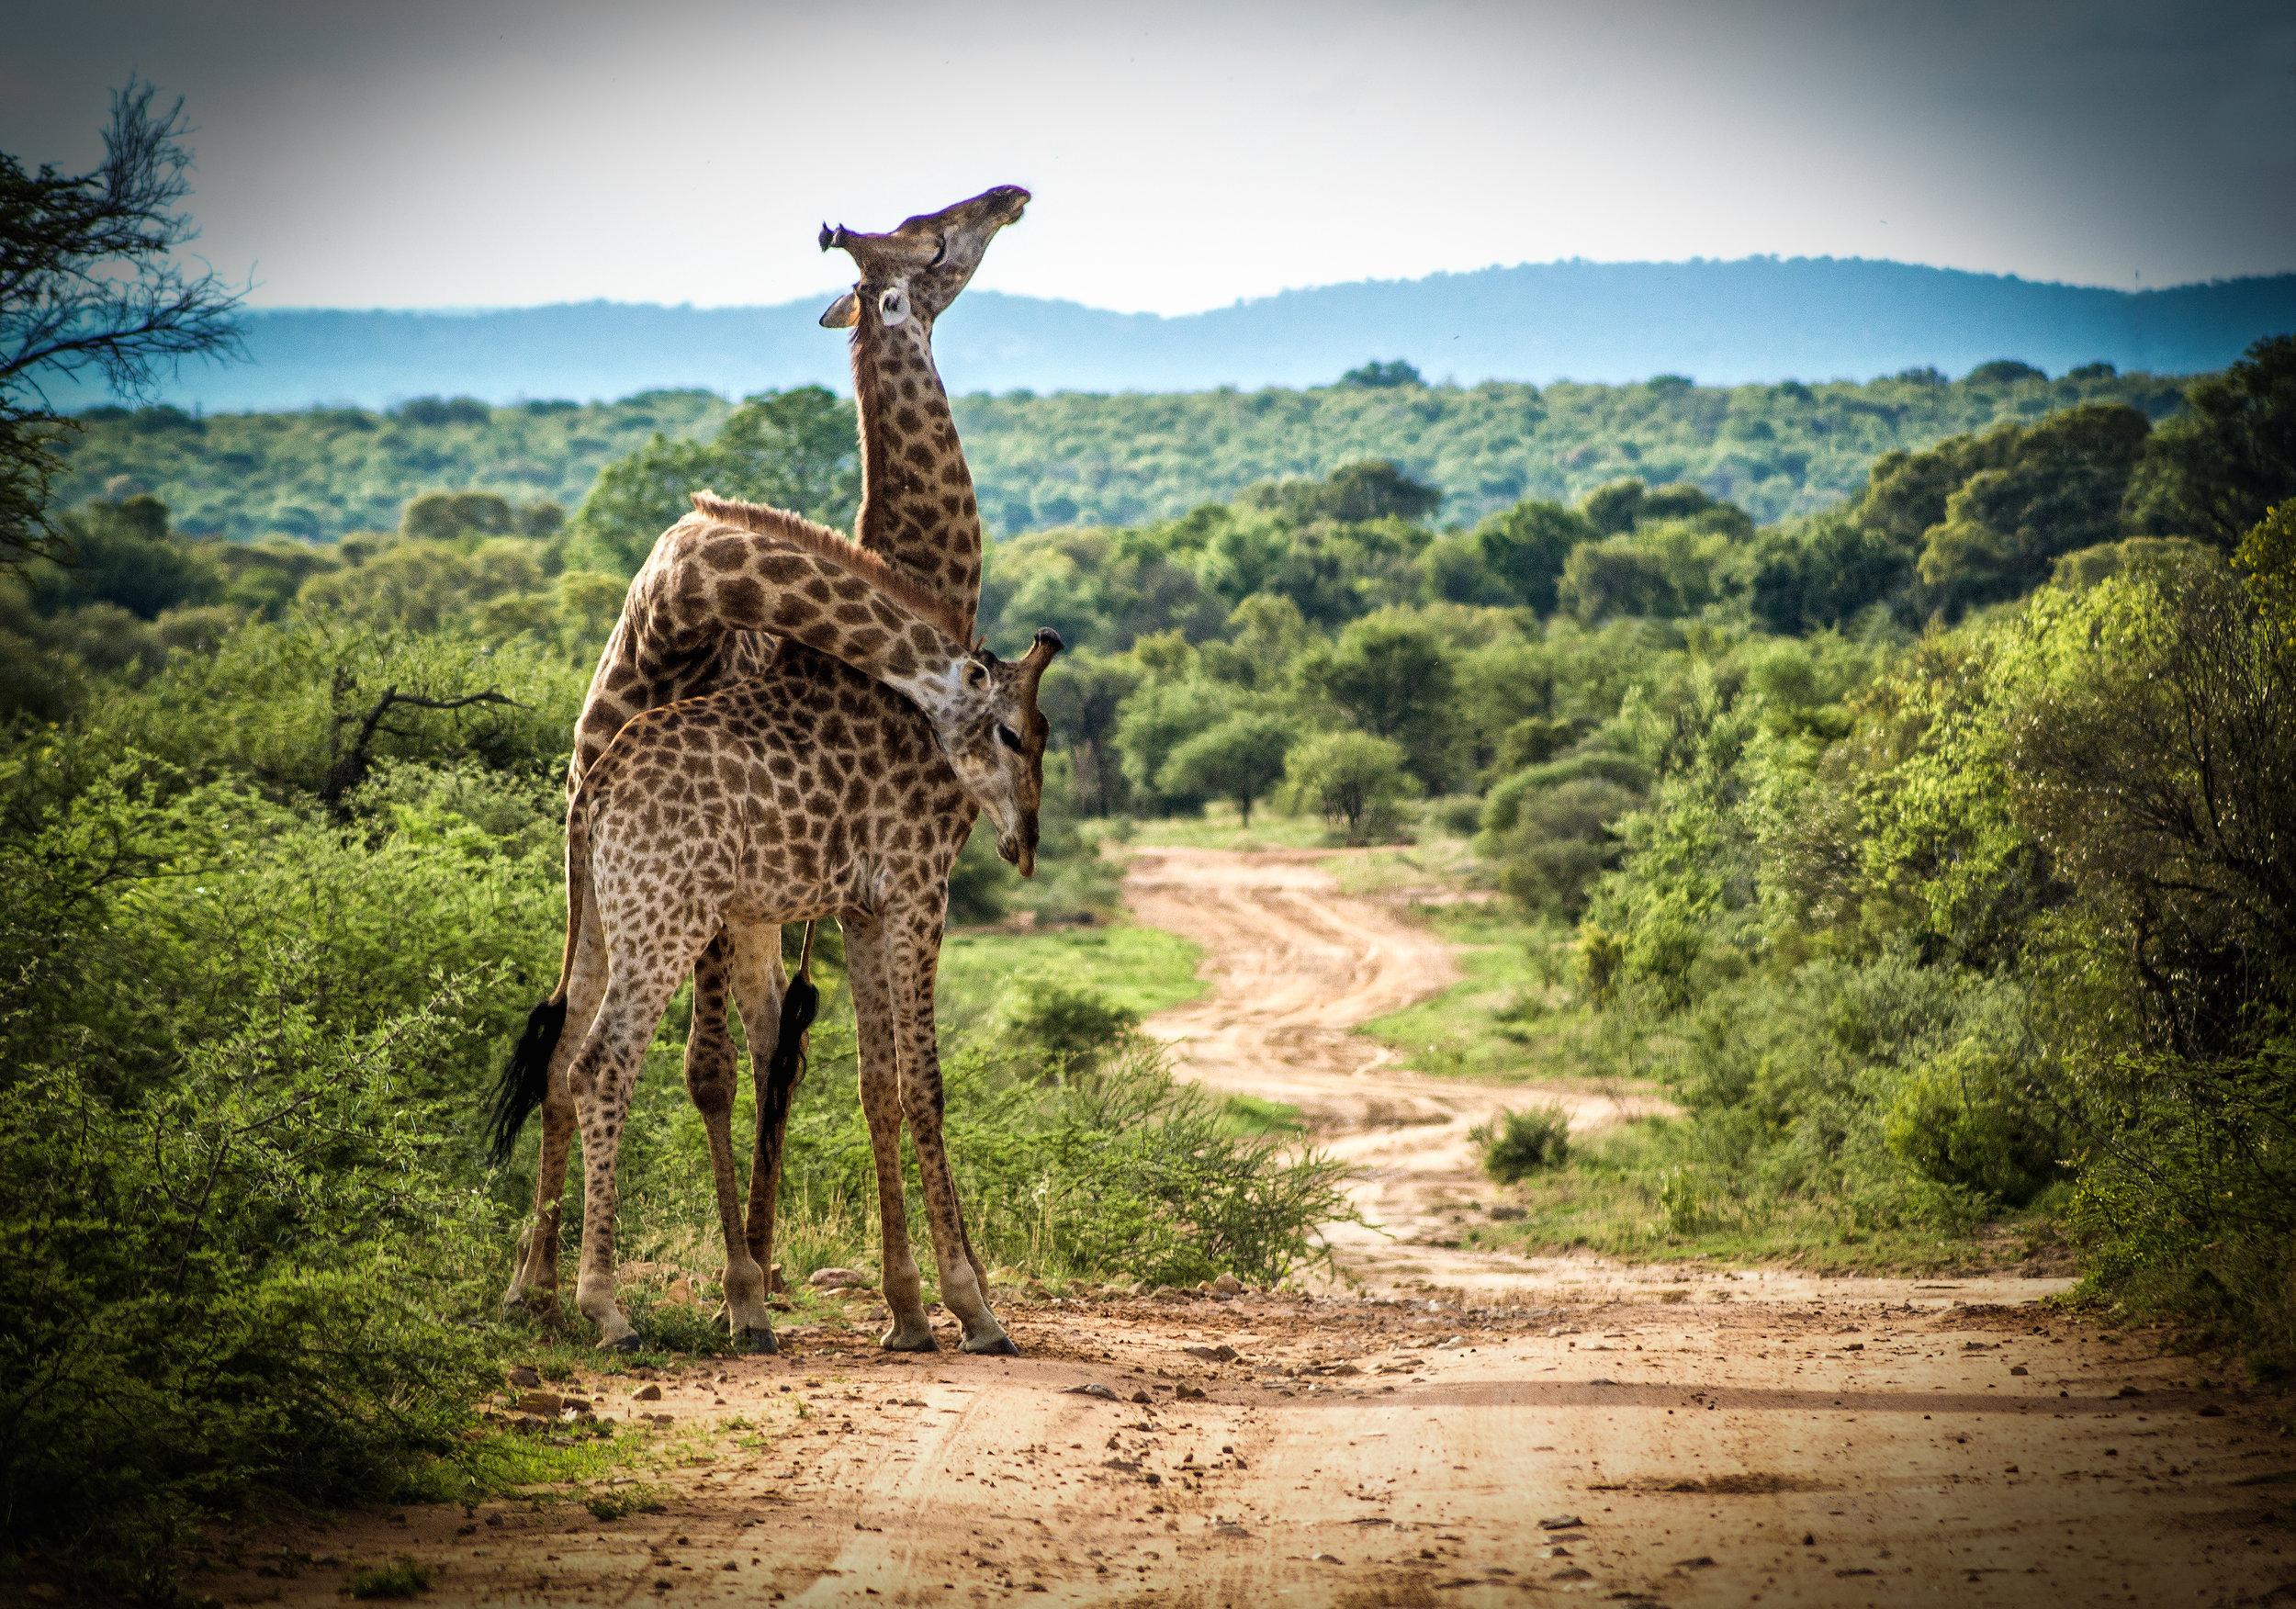 picfair-0465490-giraffe-fighting.jpg